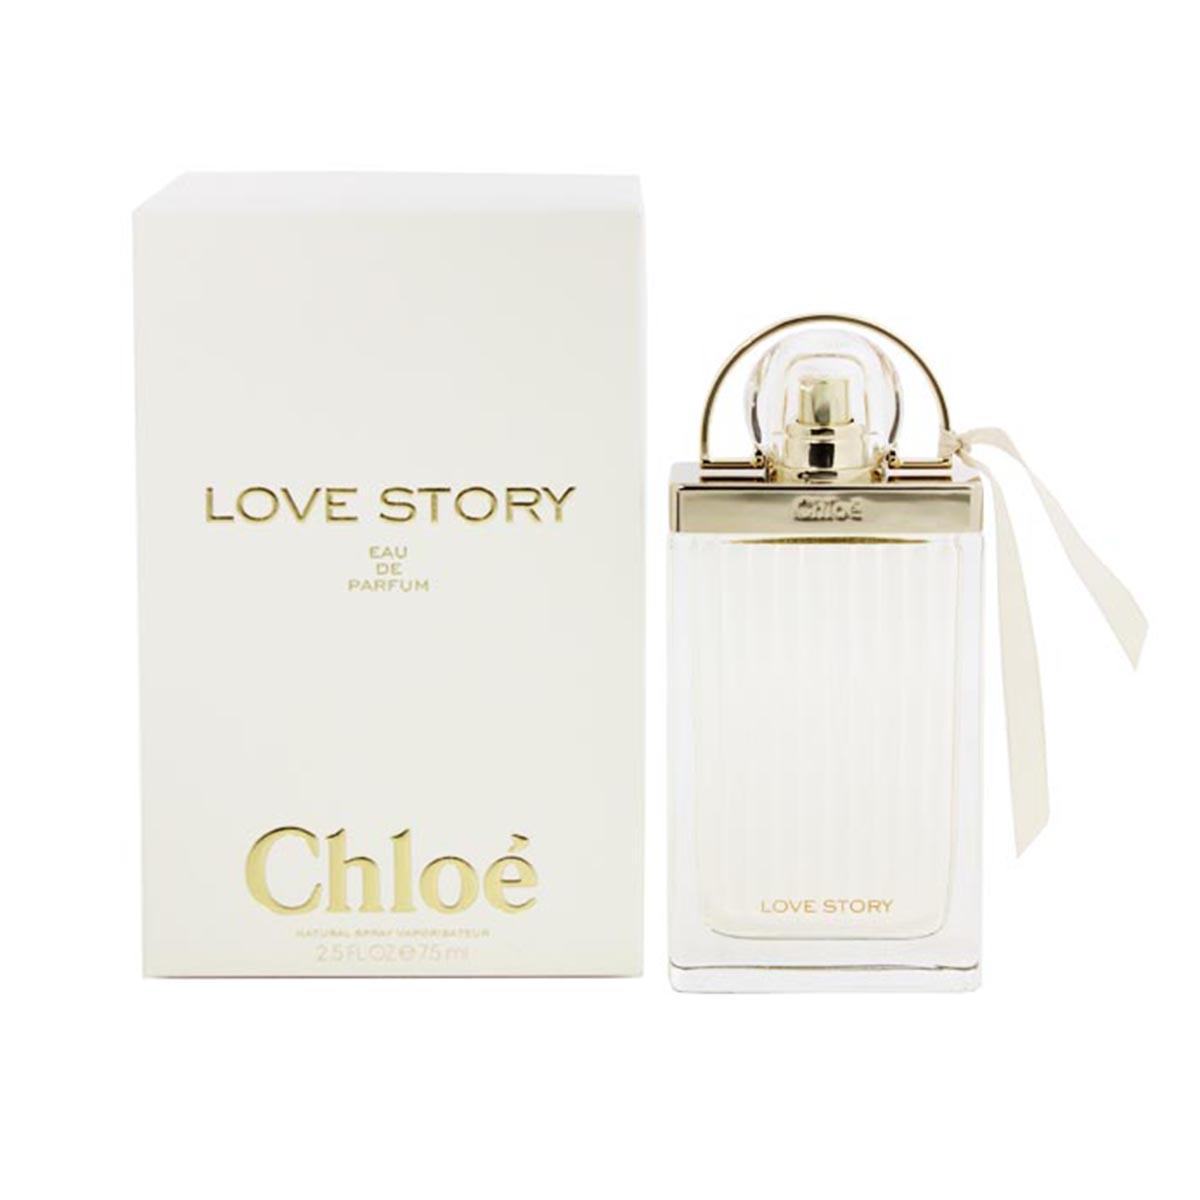 Chloe love story eau de parfum 75ml vaporizador